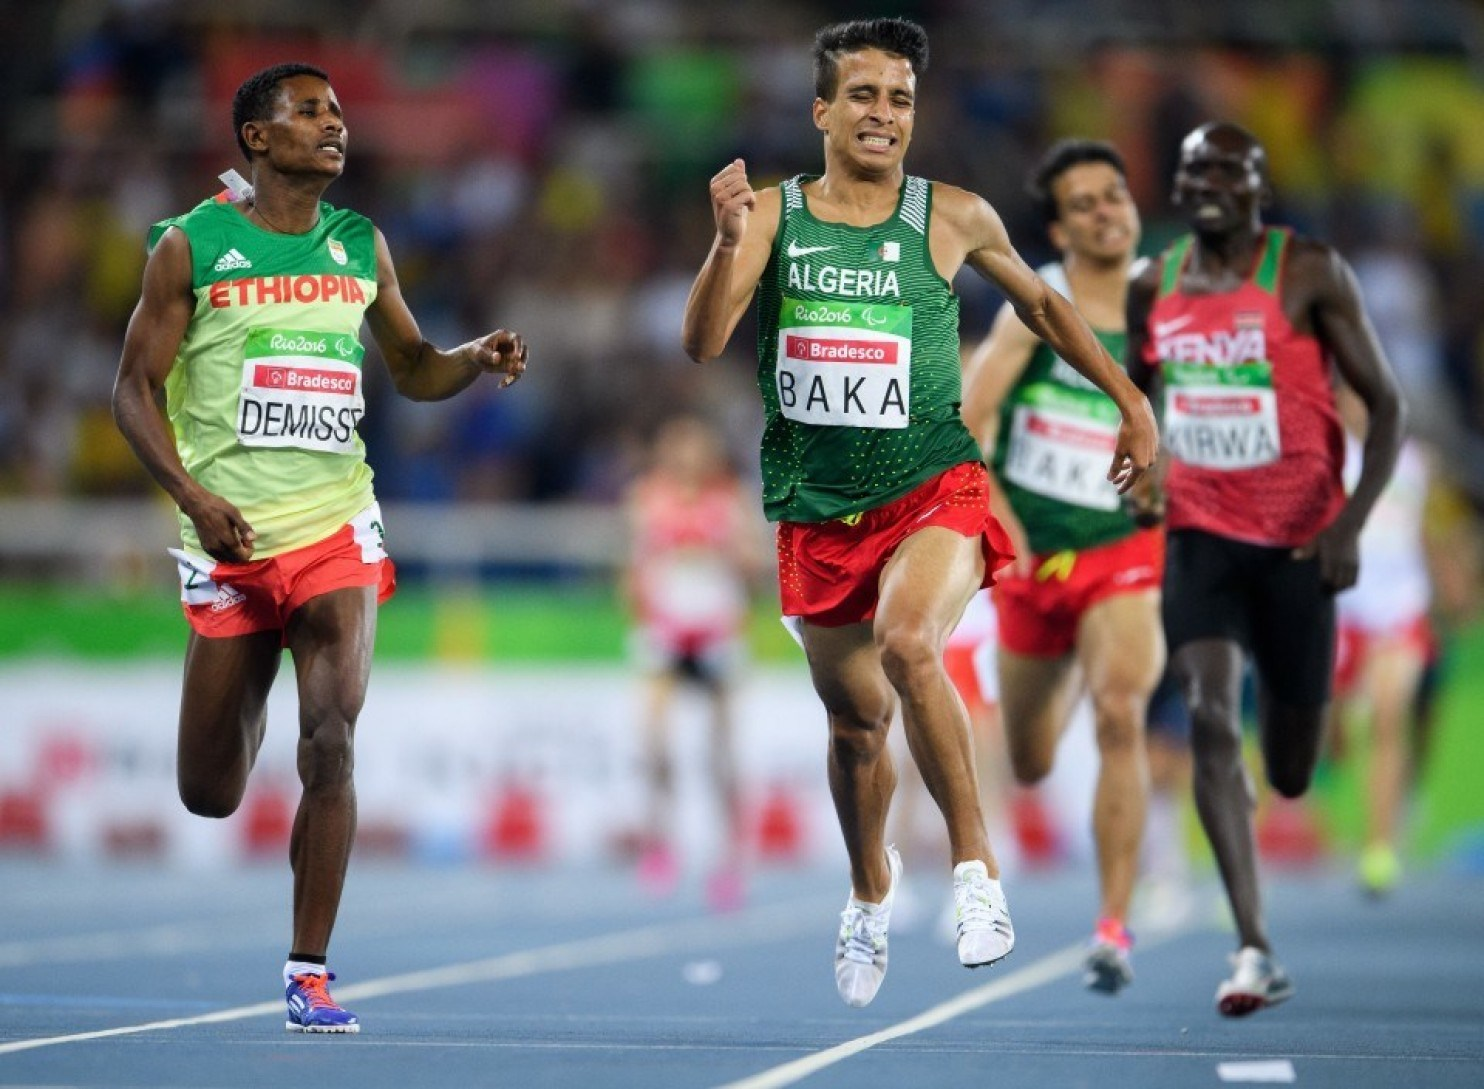 Algeria's Abdellatif Baka narrowly wins the gold ahead of Ethiopia's Tamiru Demisse in the men's 1,500-meter T13 final.